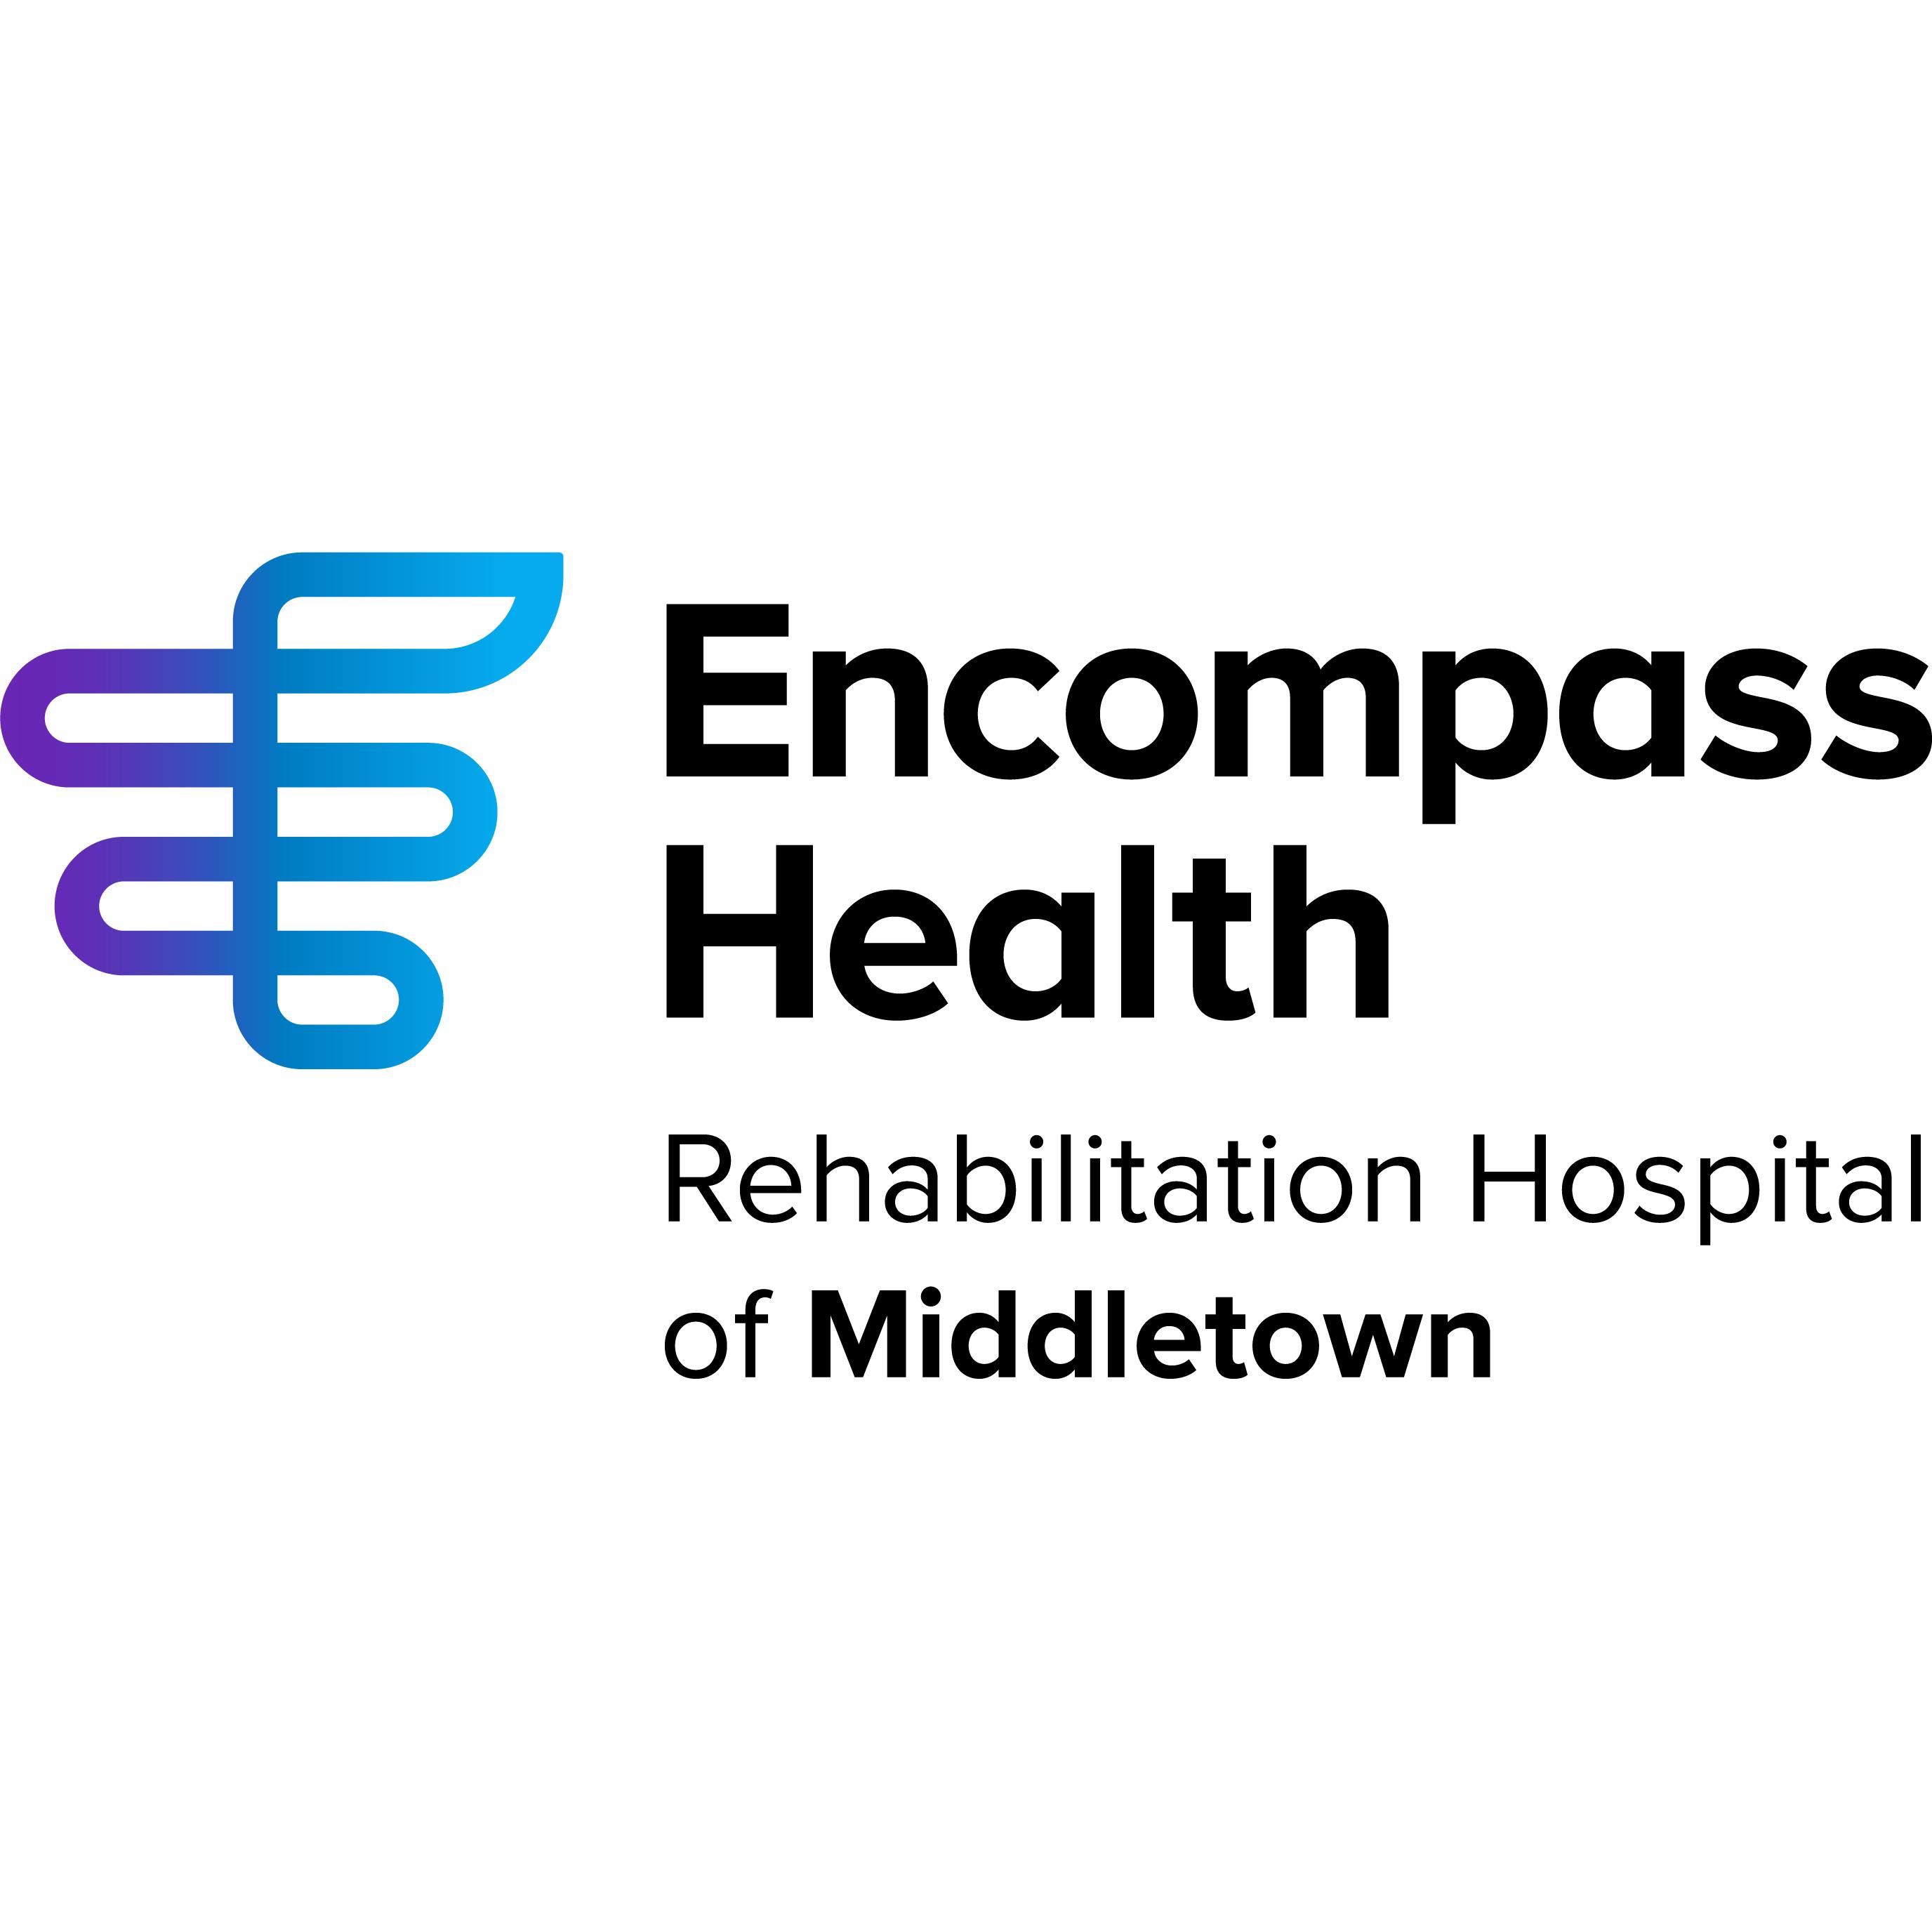 Encompass Health Rehabilitation Hospital of Middletown